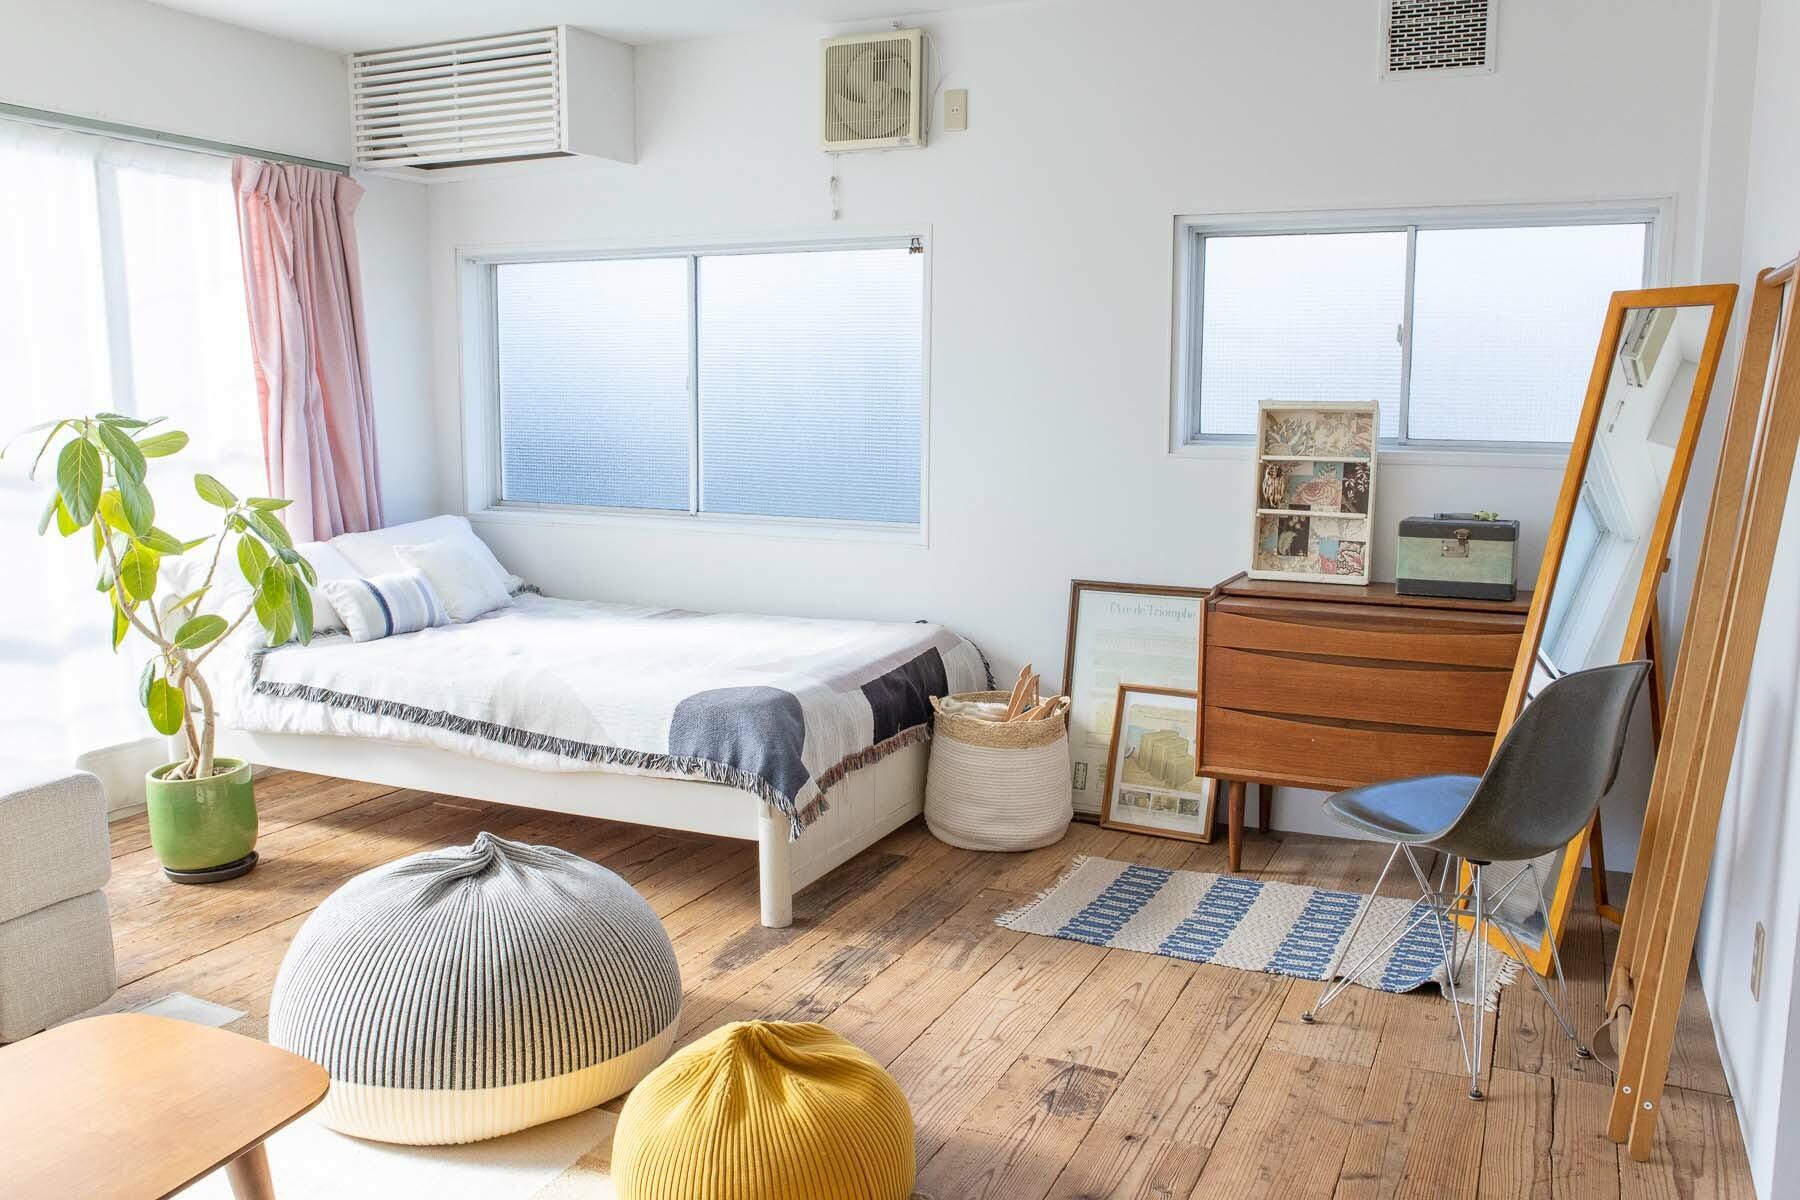 STUDIO RODAN(スタジオロダン) 2~3F2-3F 階段です